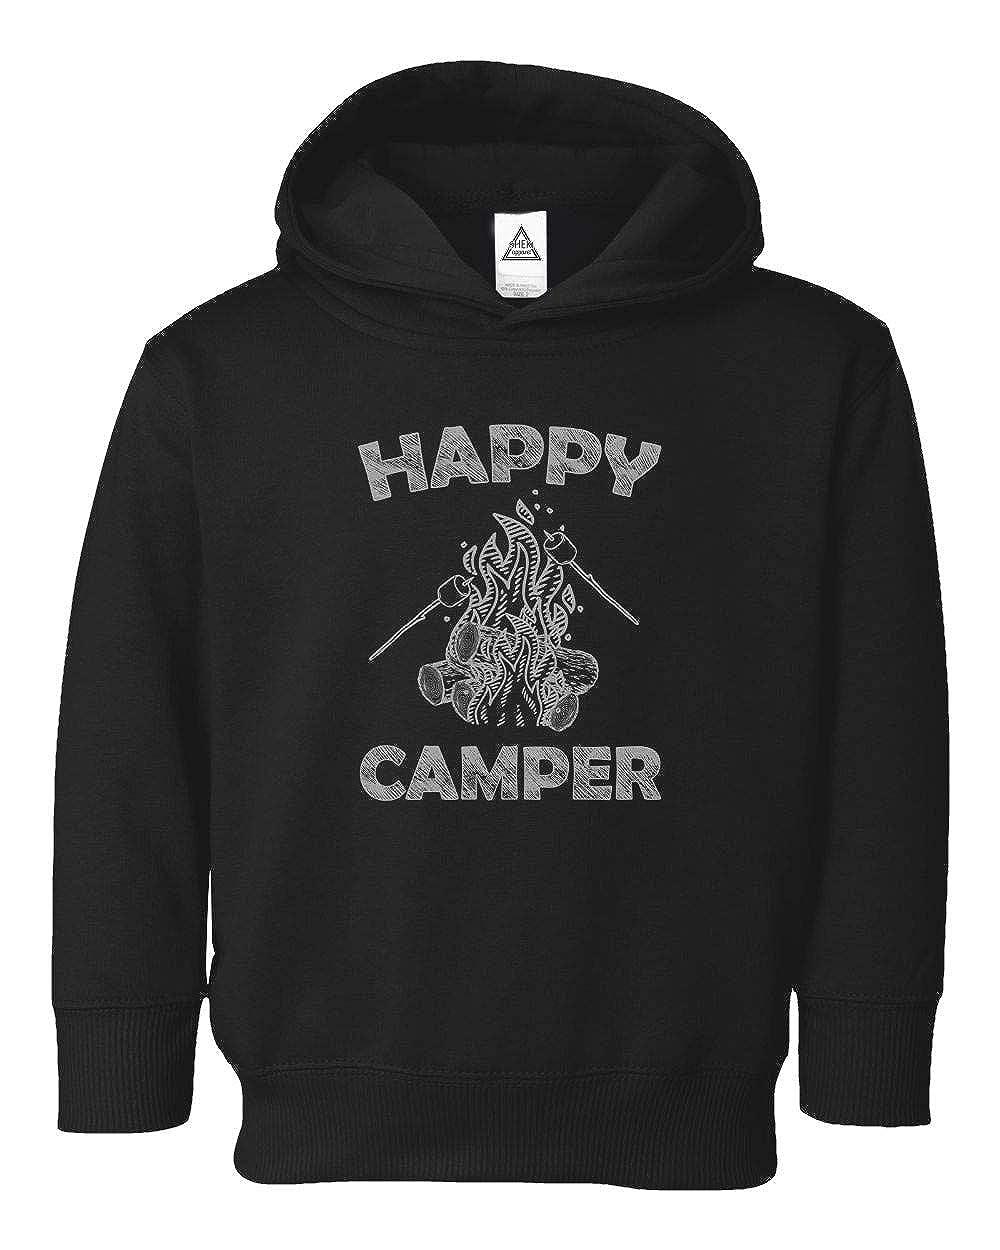 Happy Camper Cool Camping Vintage Funny Retro Design Little Kids Pullover Hoodie Toddler Sweatshirt